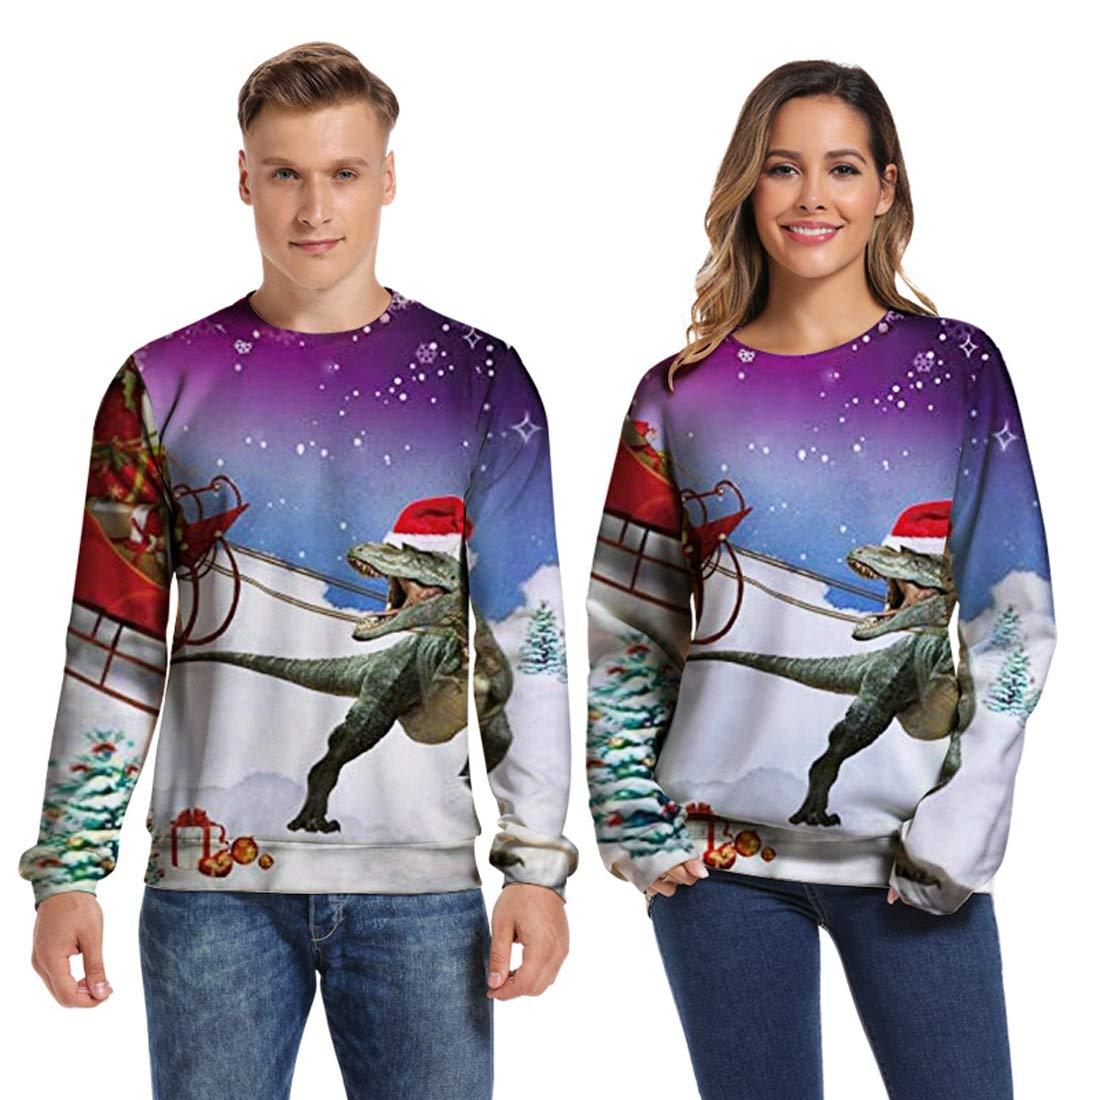 URVIP Unisex 3D Printed Realistic Casual Galaxy Hoodies Pullover Sweatshirt